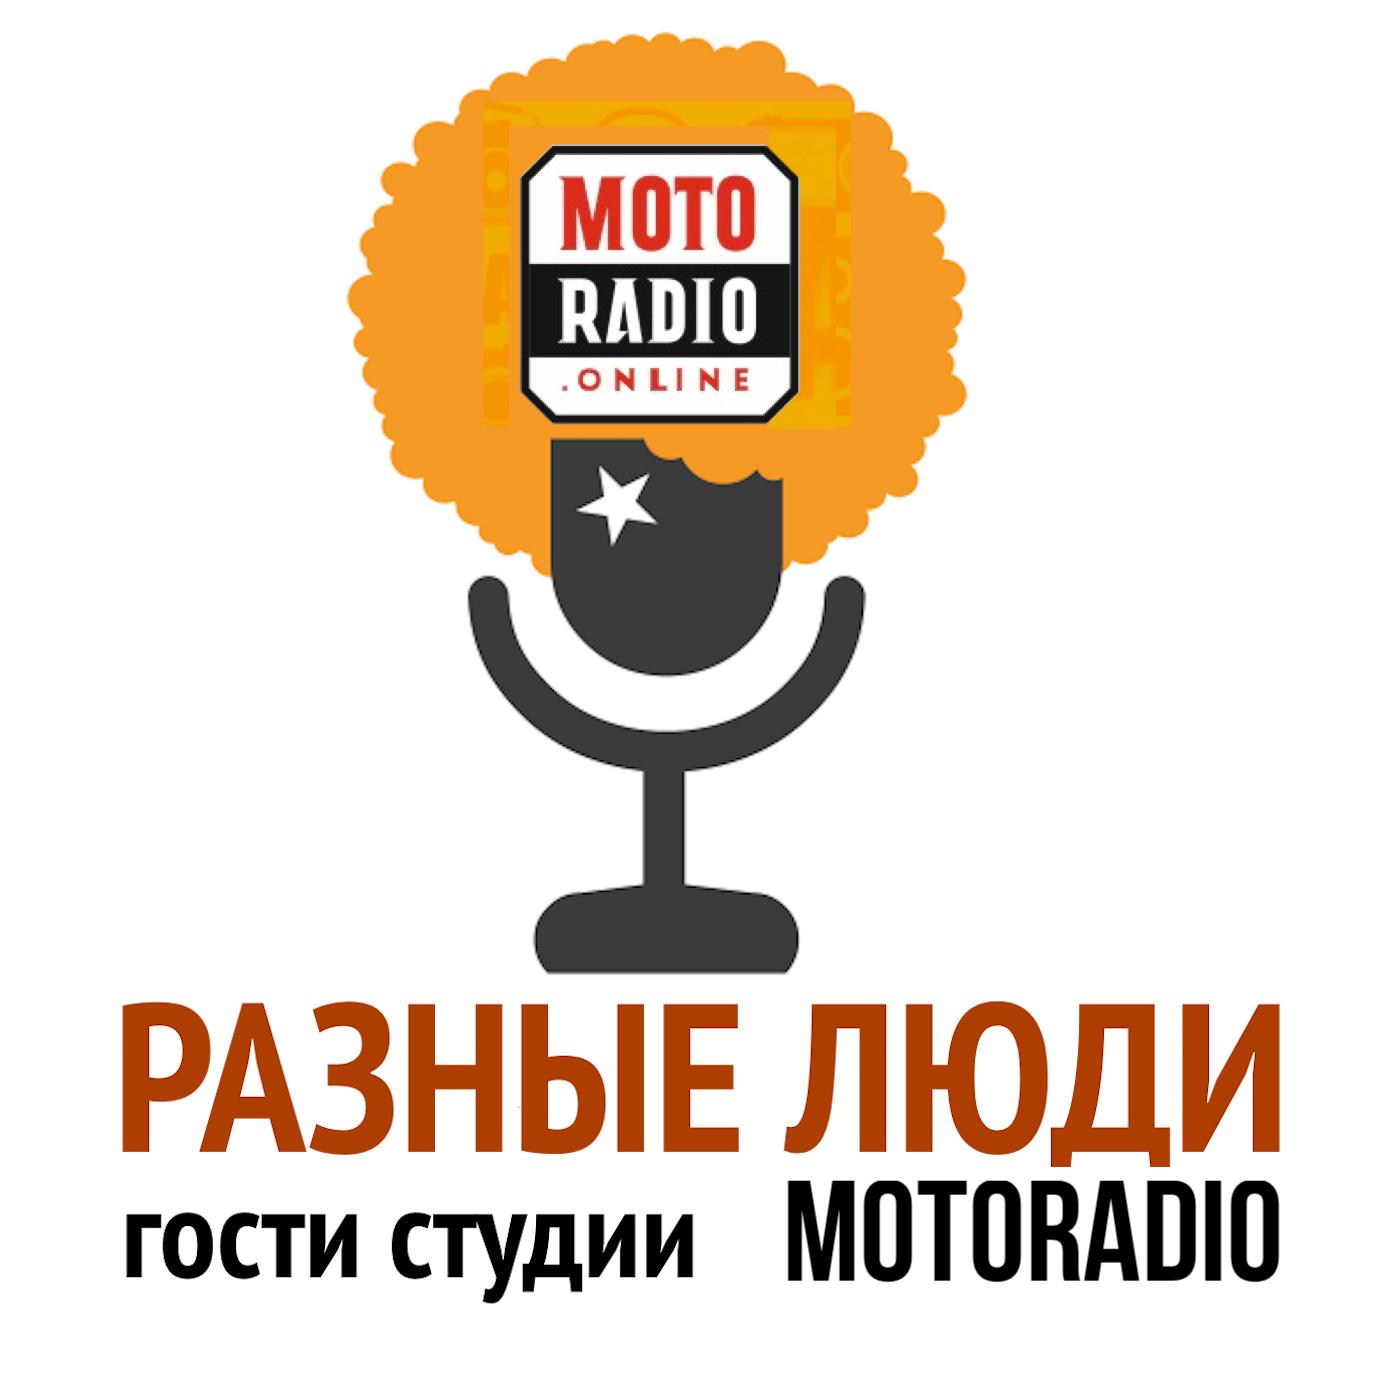 Моторадио Андрей Ургант и кузнецы андрей бандера андрей бандера mp3